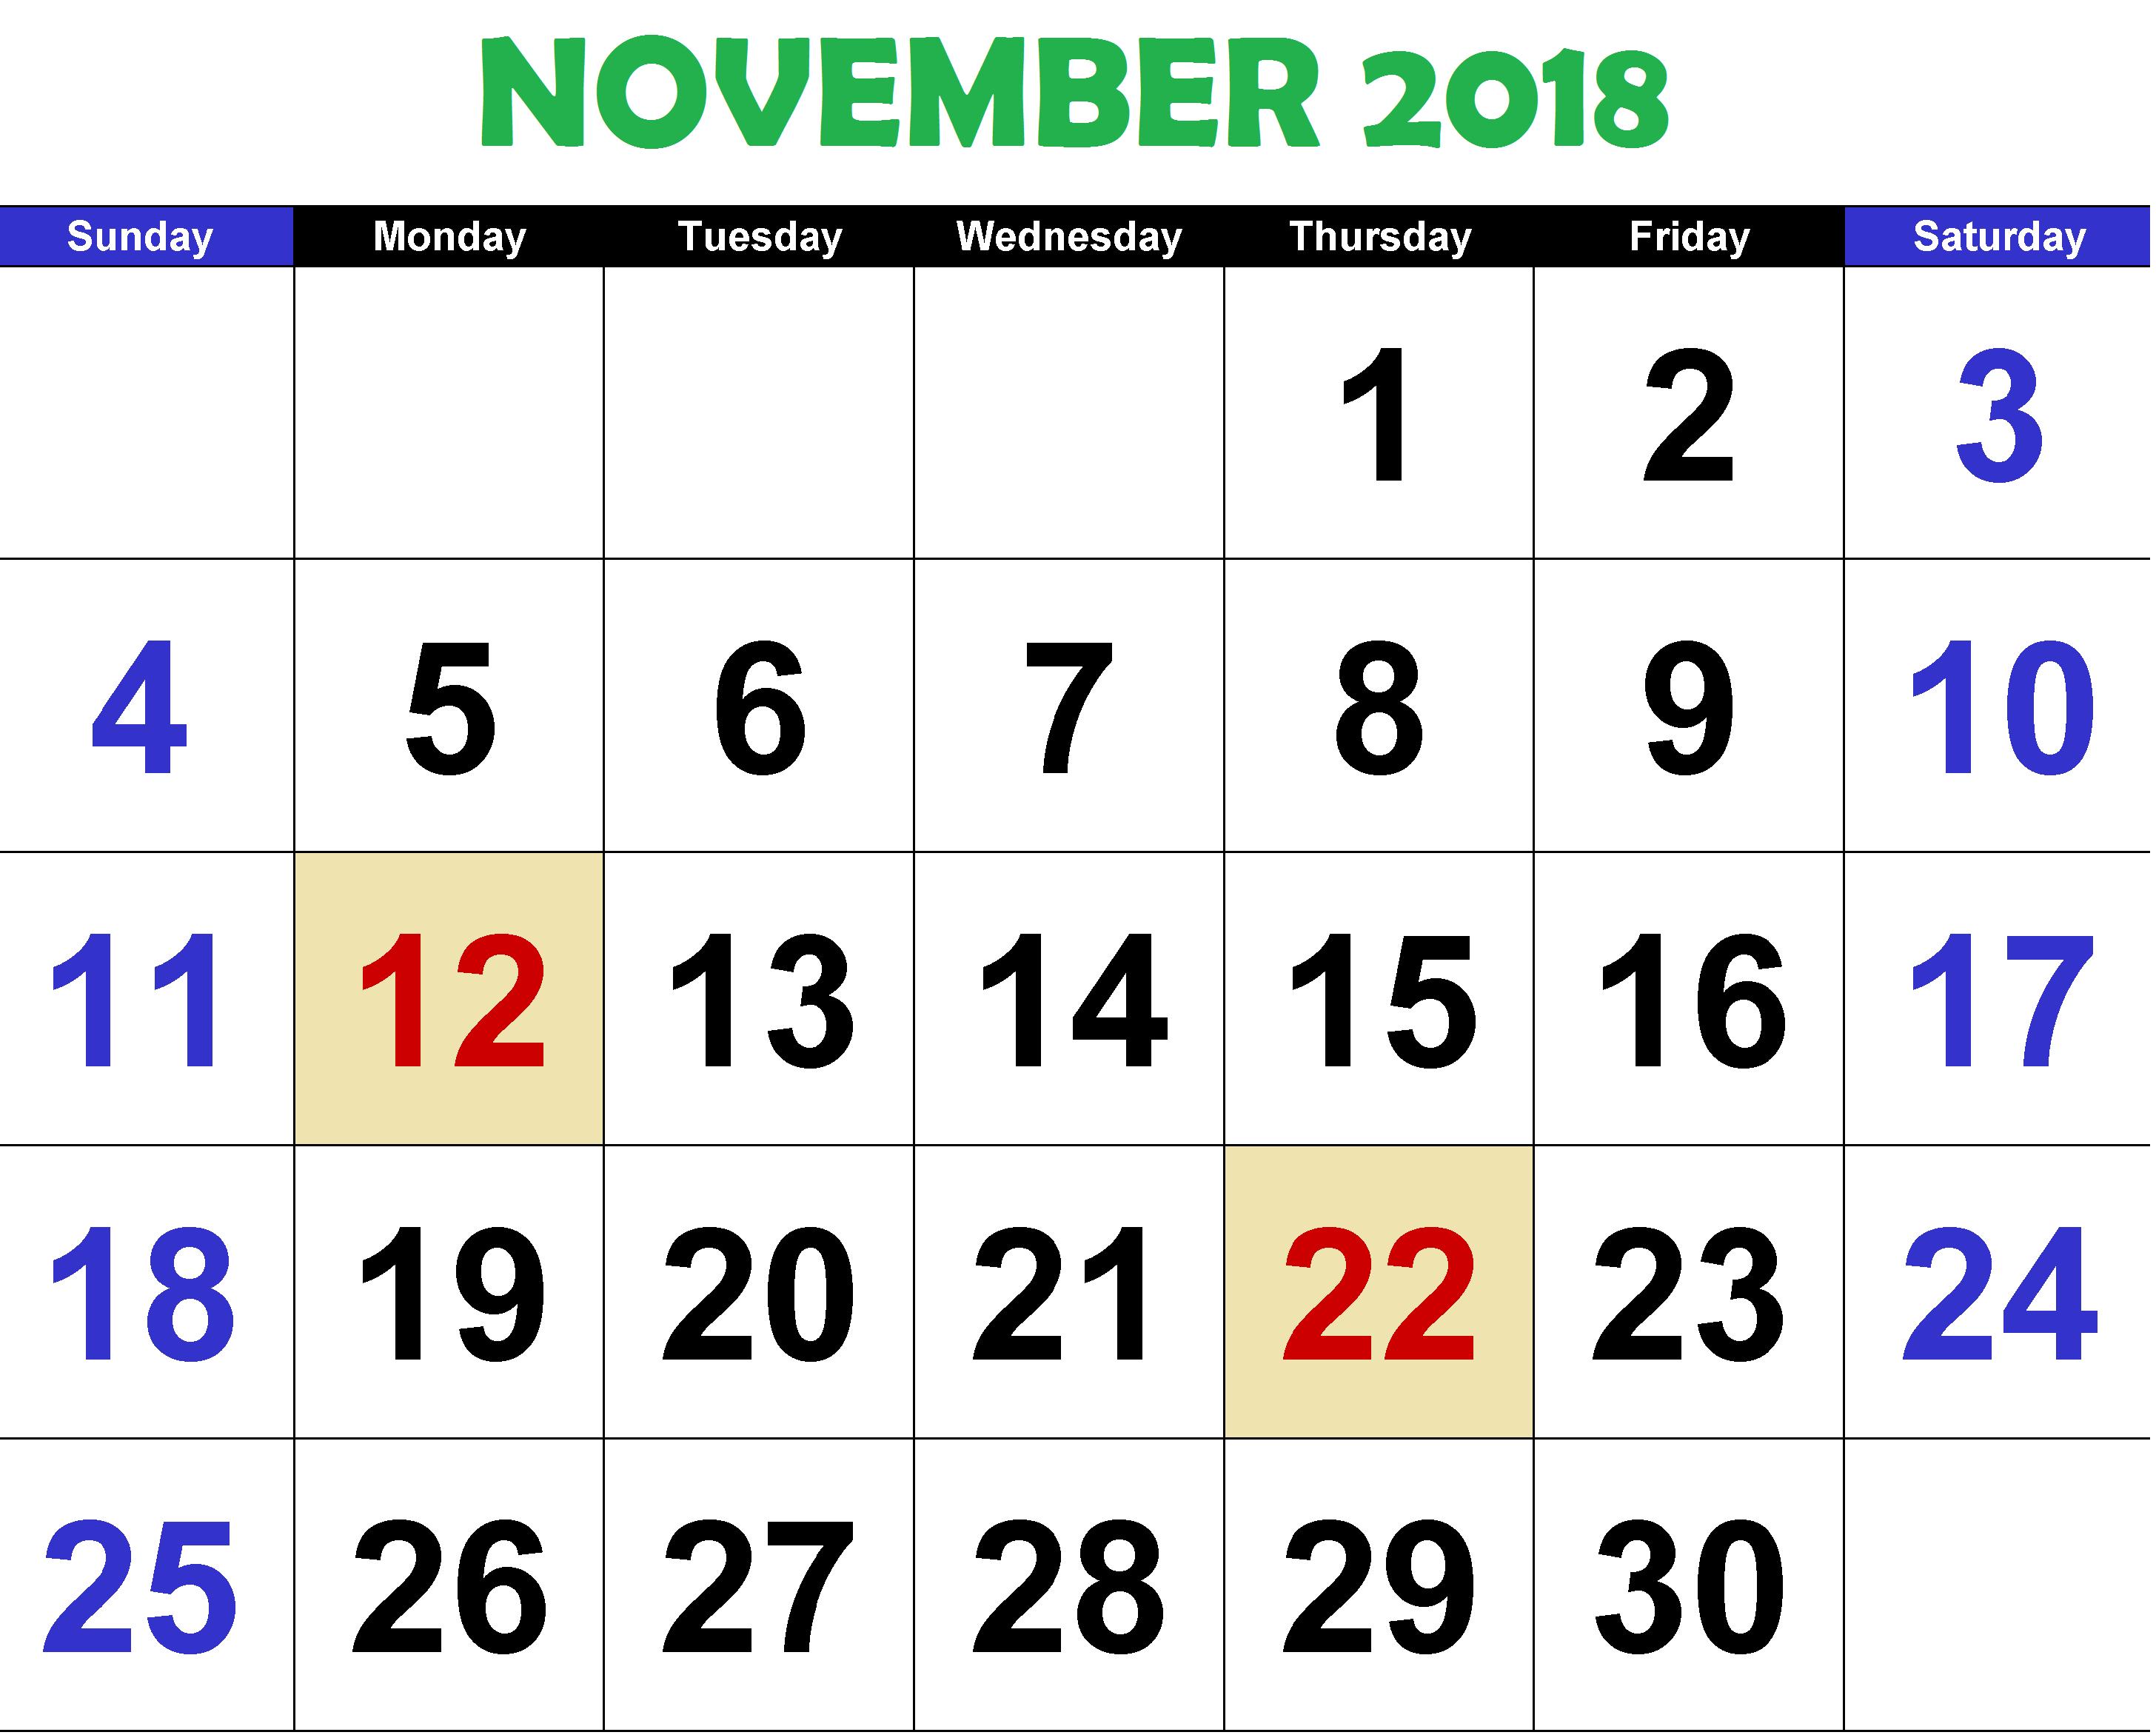 November 2018 Calendar with Holidays Word